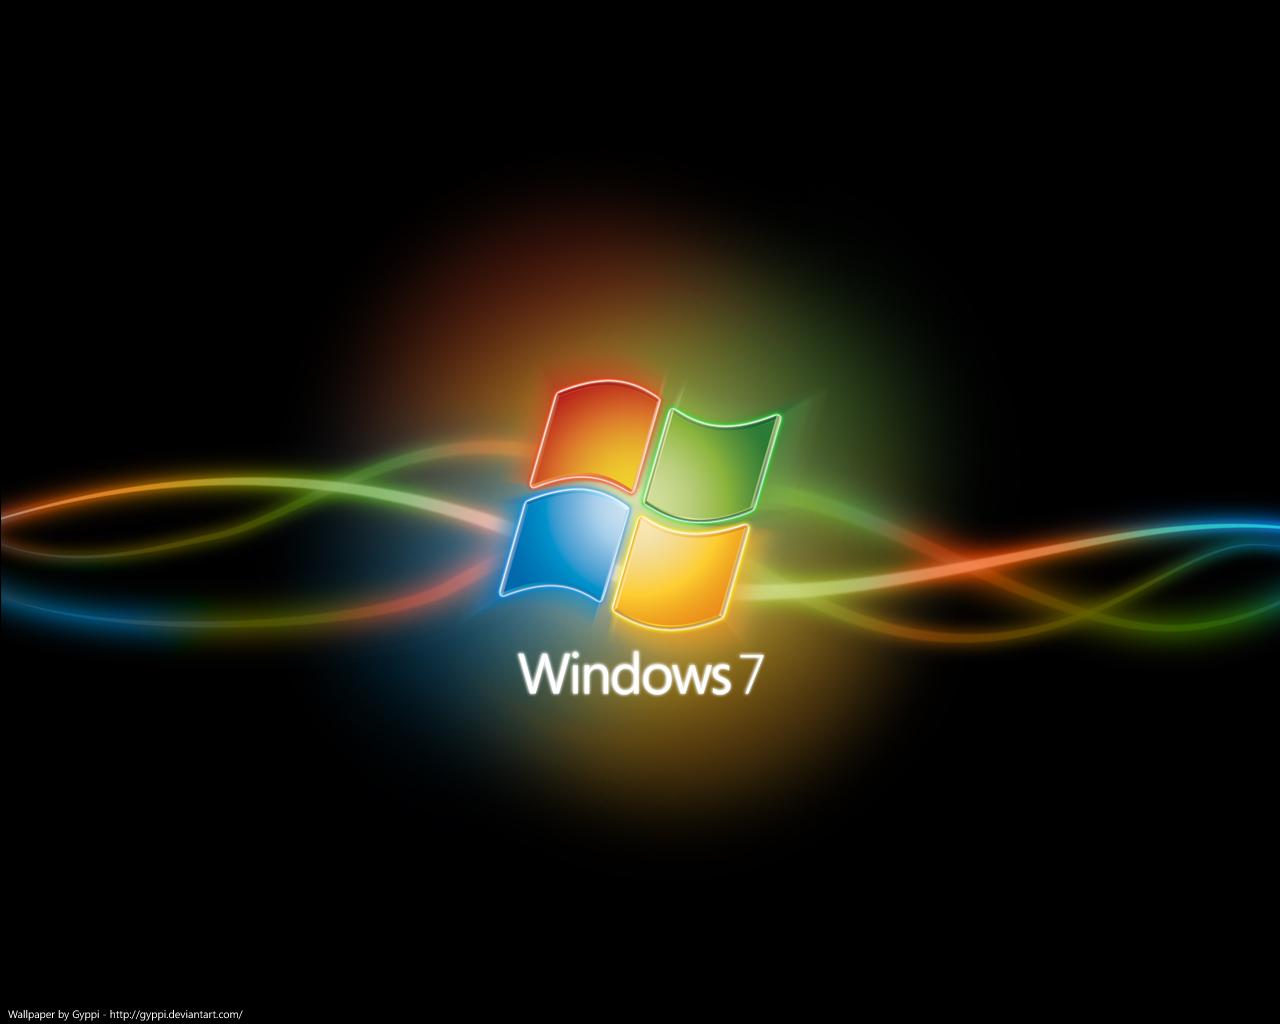 http://4.bp.blogspot.com/_3G4dg-GWVKI/THuCEJgO8sI/AAAAAAAAHTM/qY7wntCLpwE/s1600/Windows7%2B-%2B(5.4)%2B%40%2B1280x1024.jpg